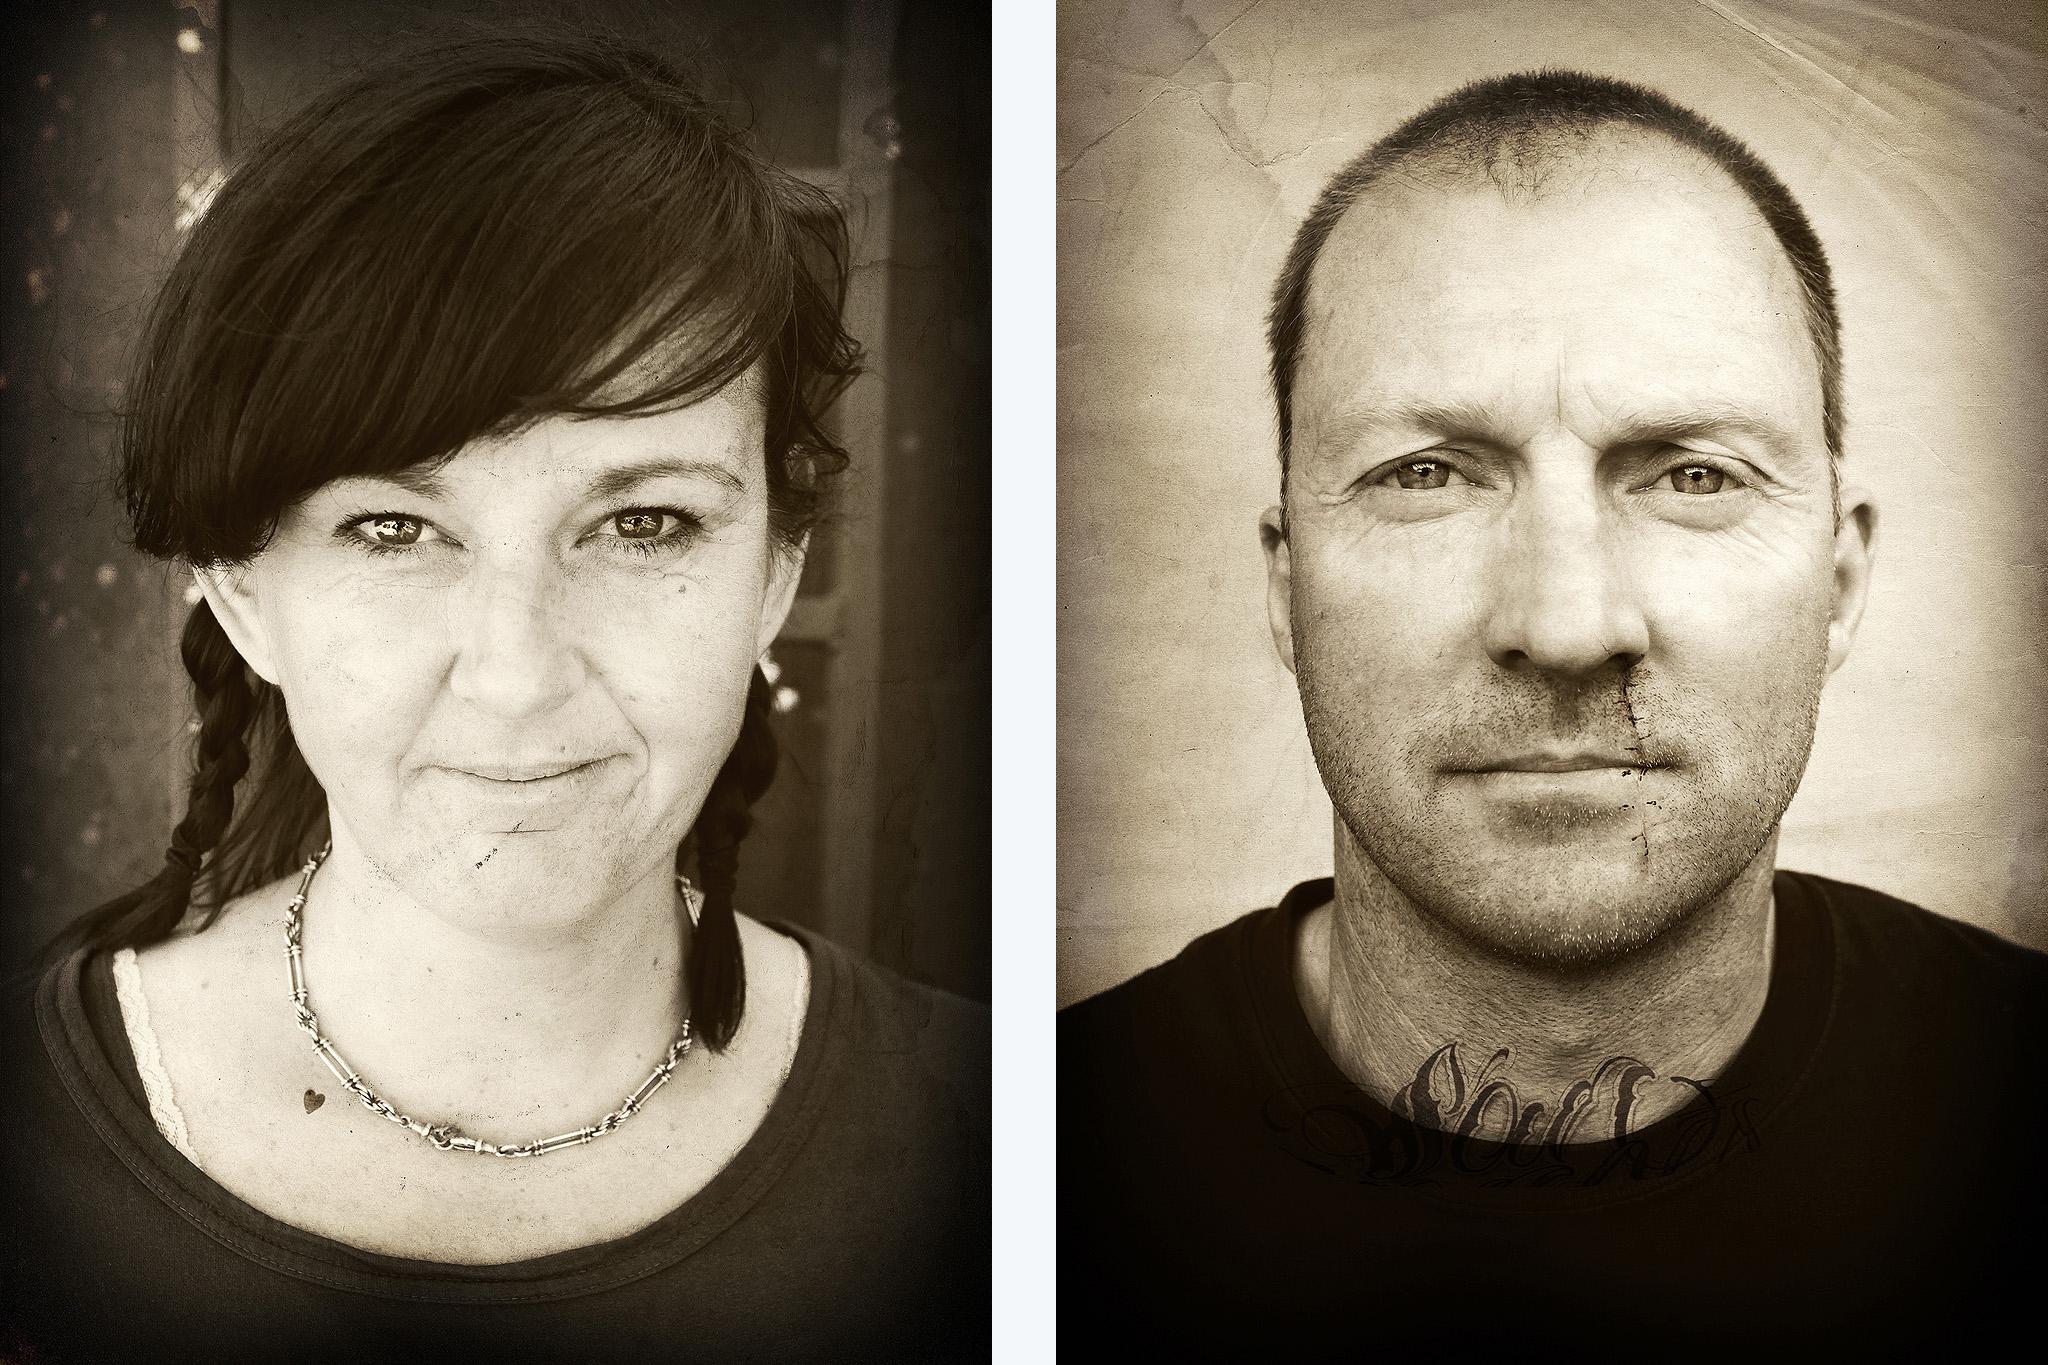 07_Alcatraz_Porträts